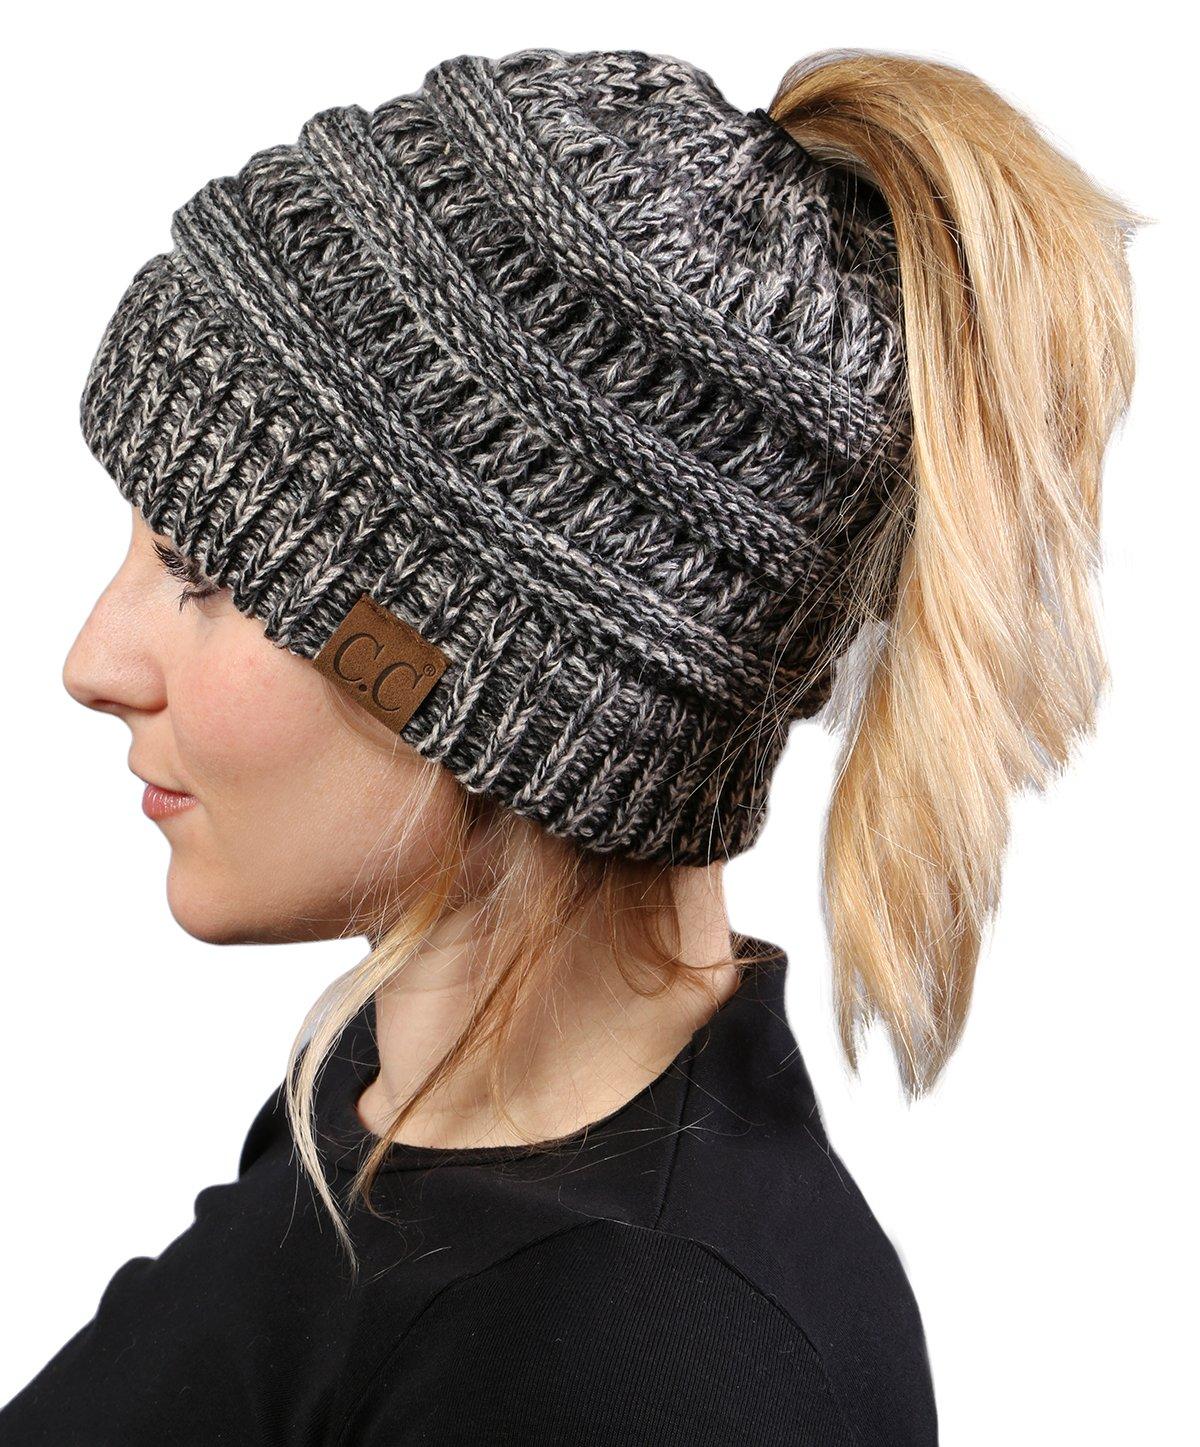 BT-6800-816.21 Messy Bun Womens Winter Knit Hat Beanie Tail - Grey/Black#31